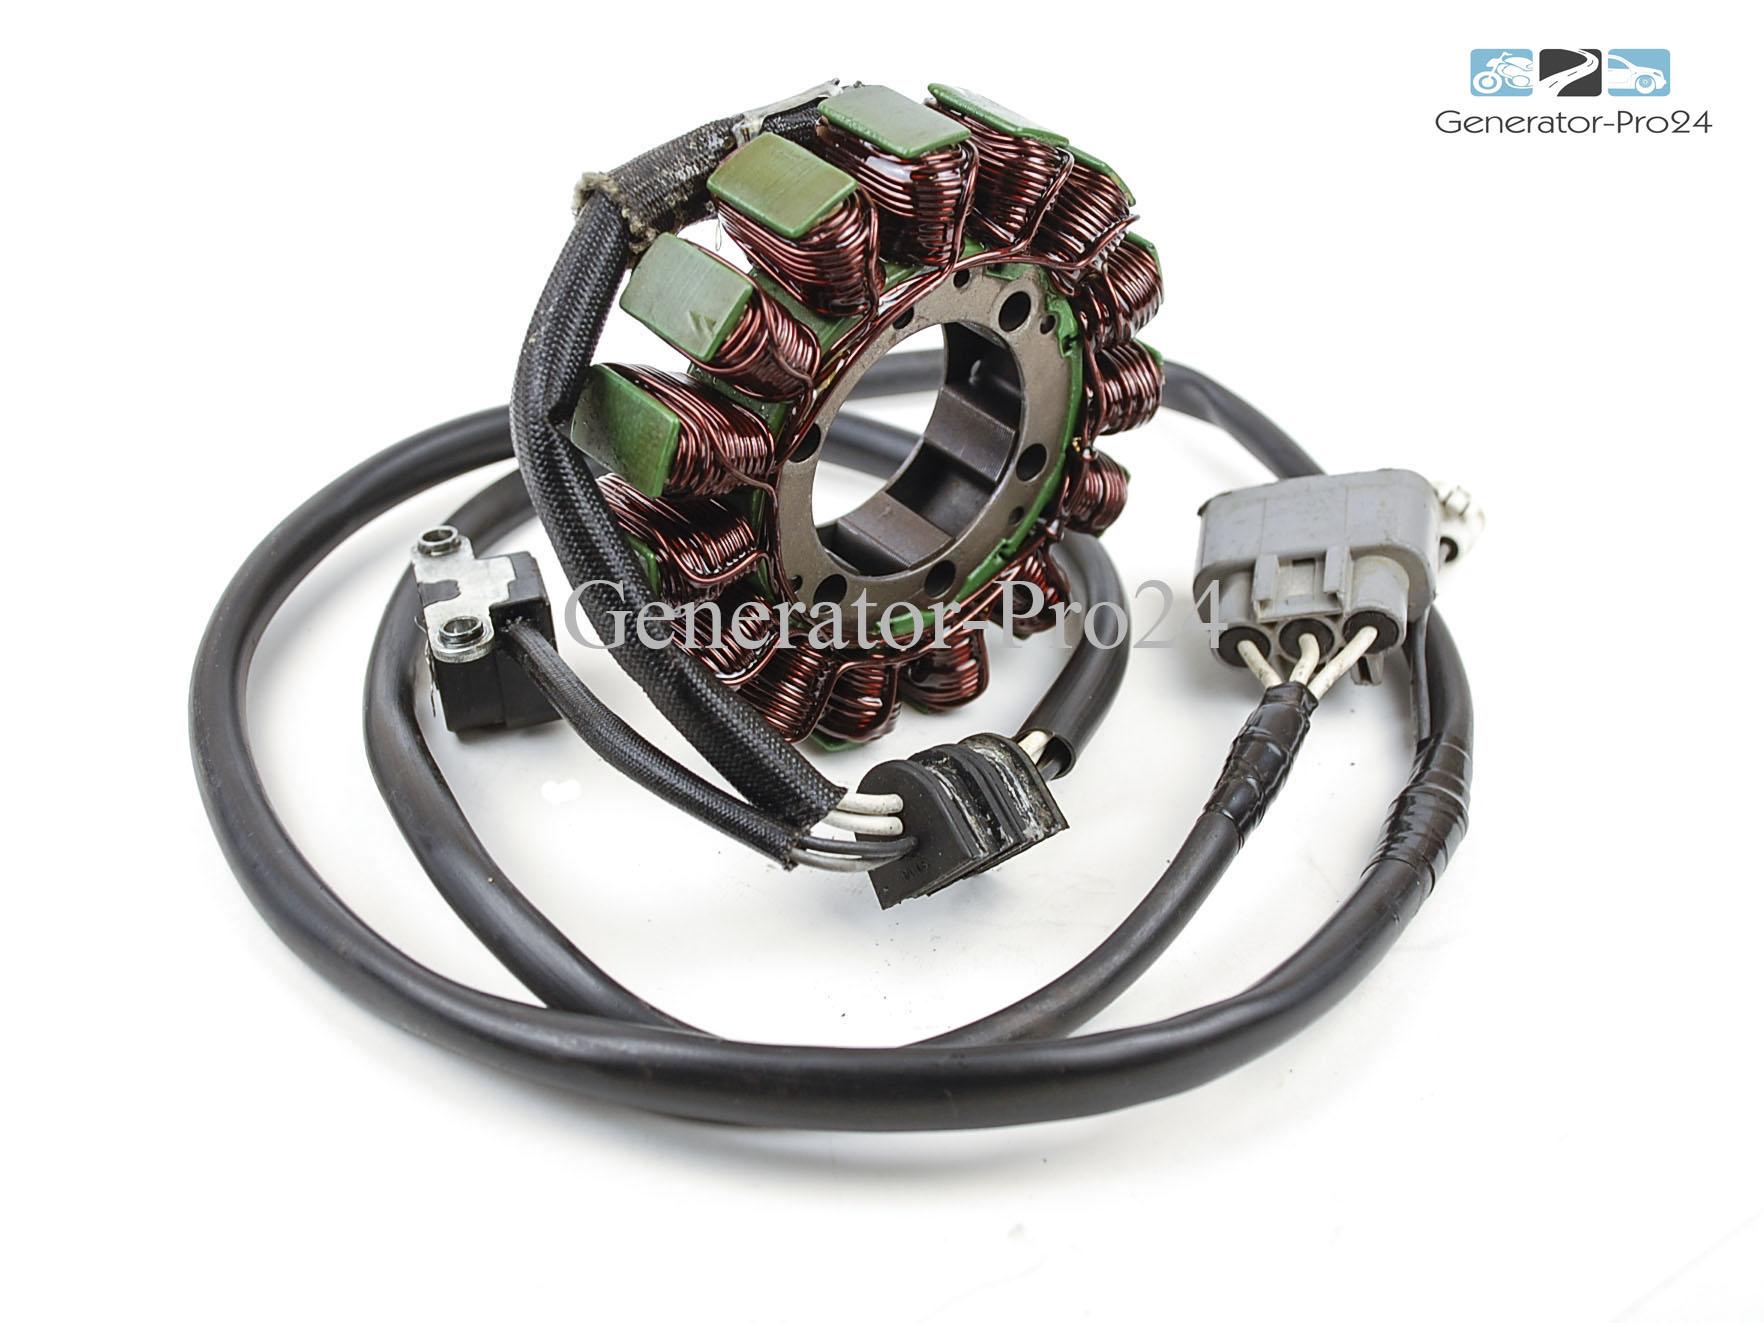 YAMAHA Stator Ass'y, 28P-81410-01-00 | Generator-Pro24